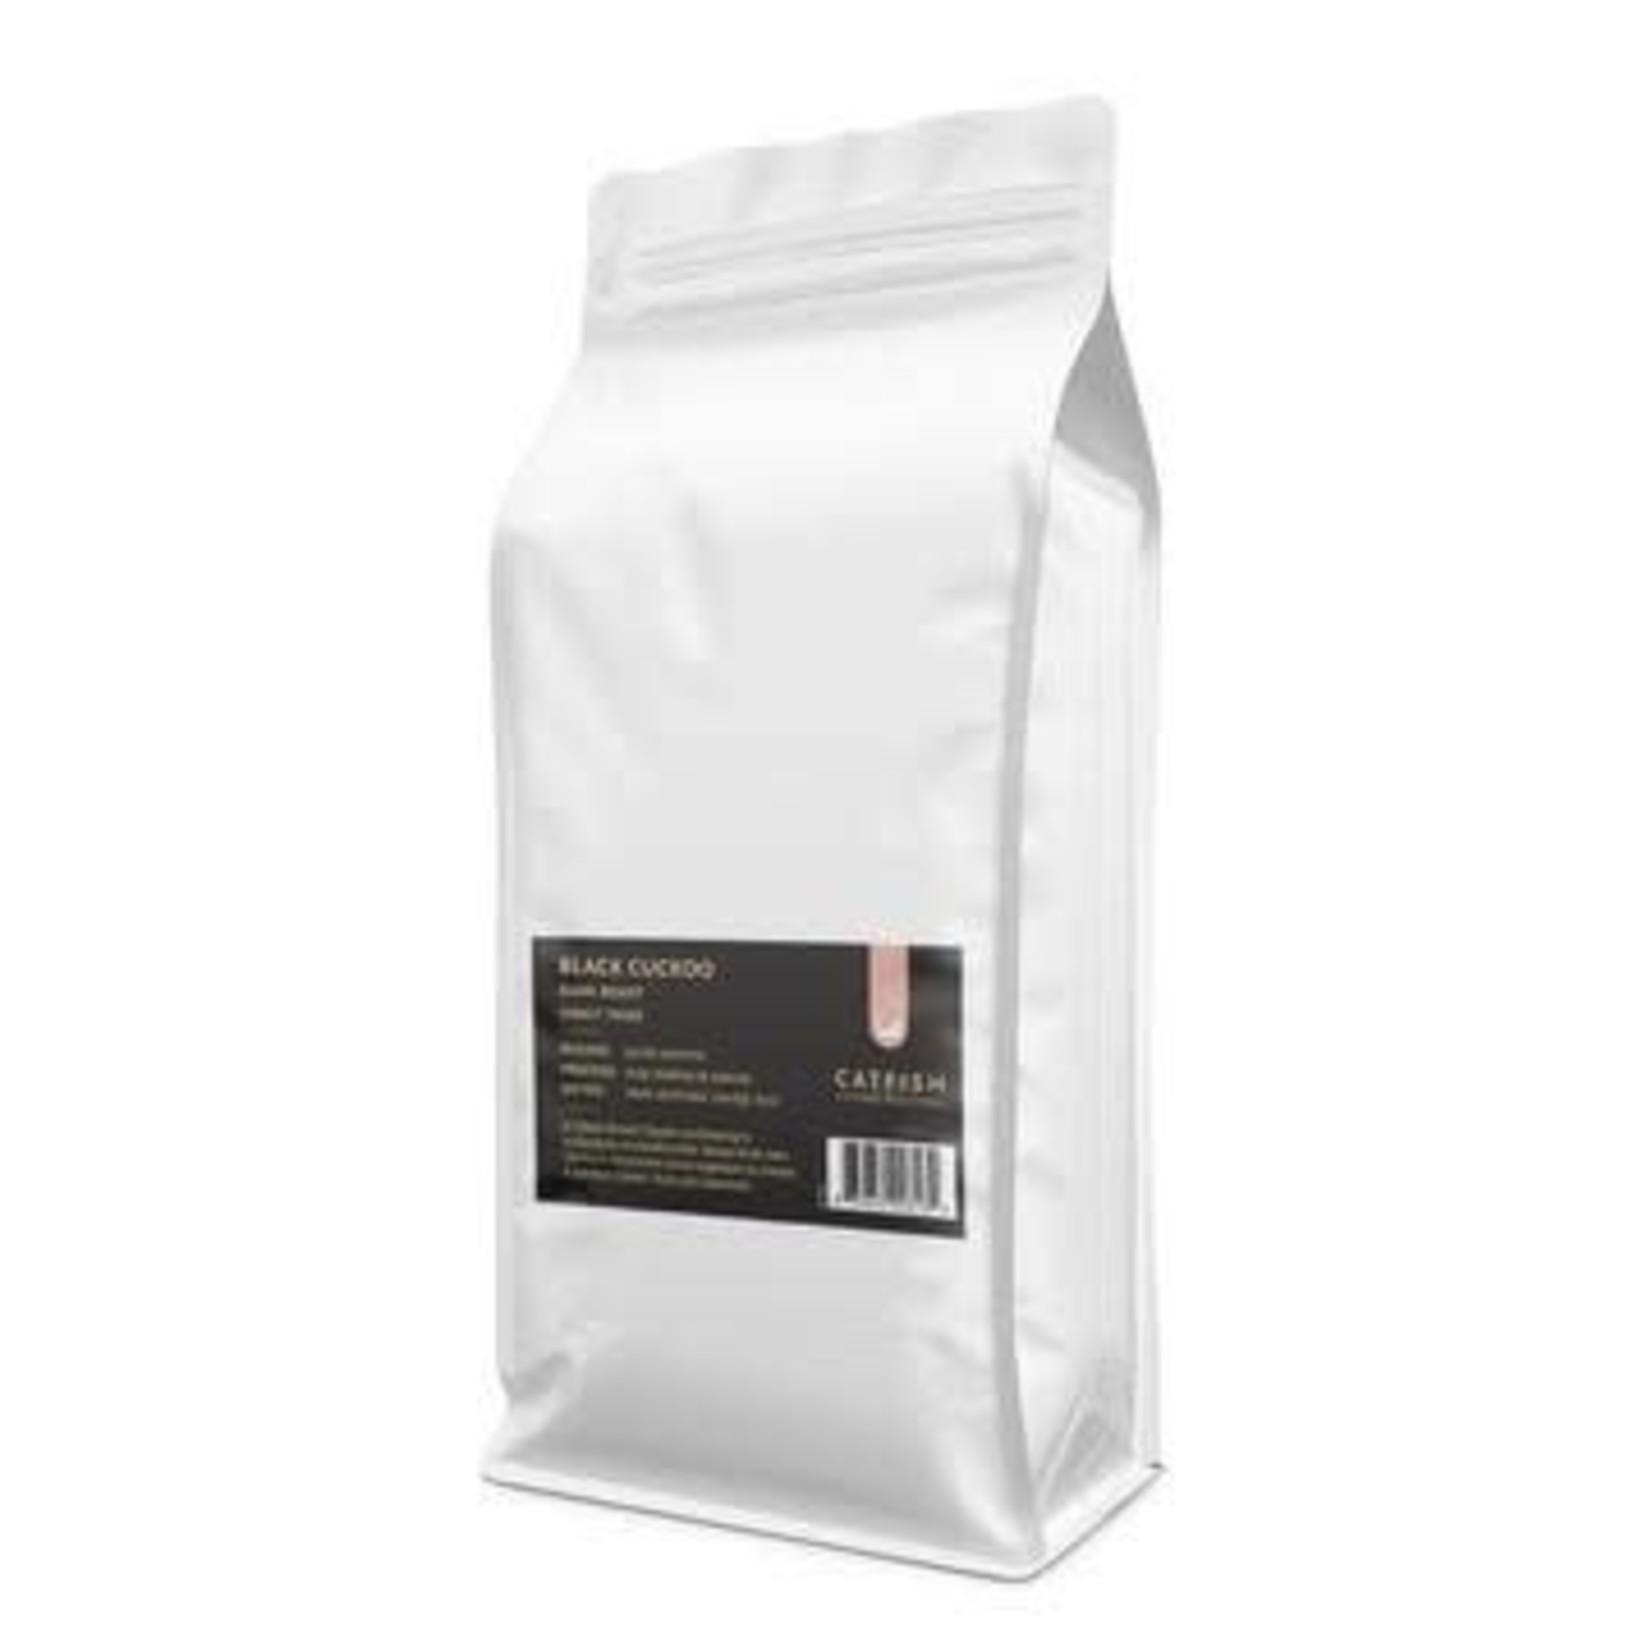 CATFISH COFFEE Black Cuckoo